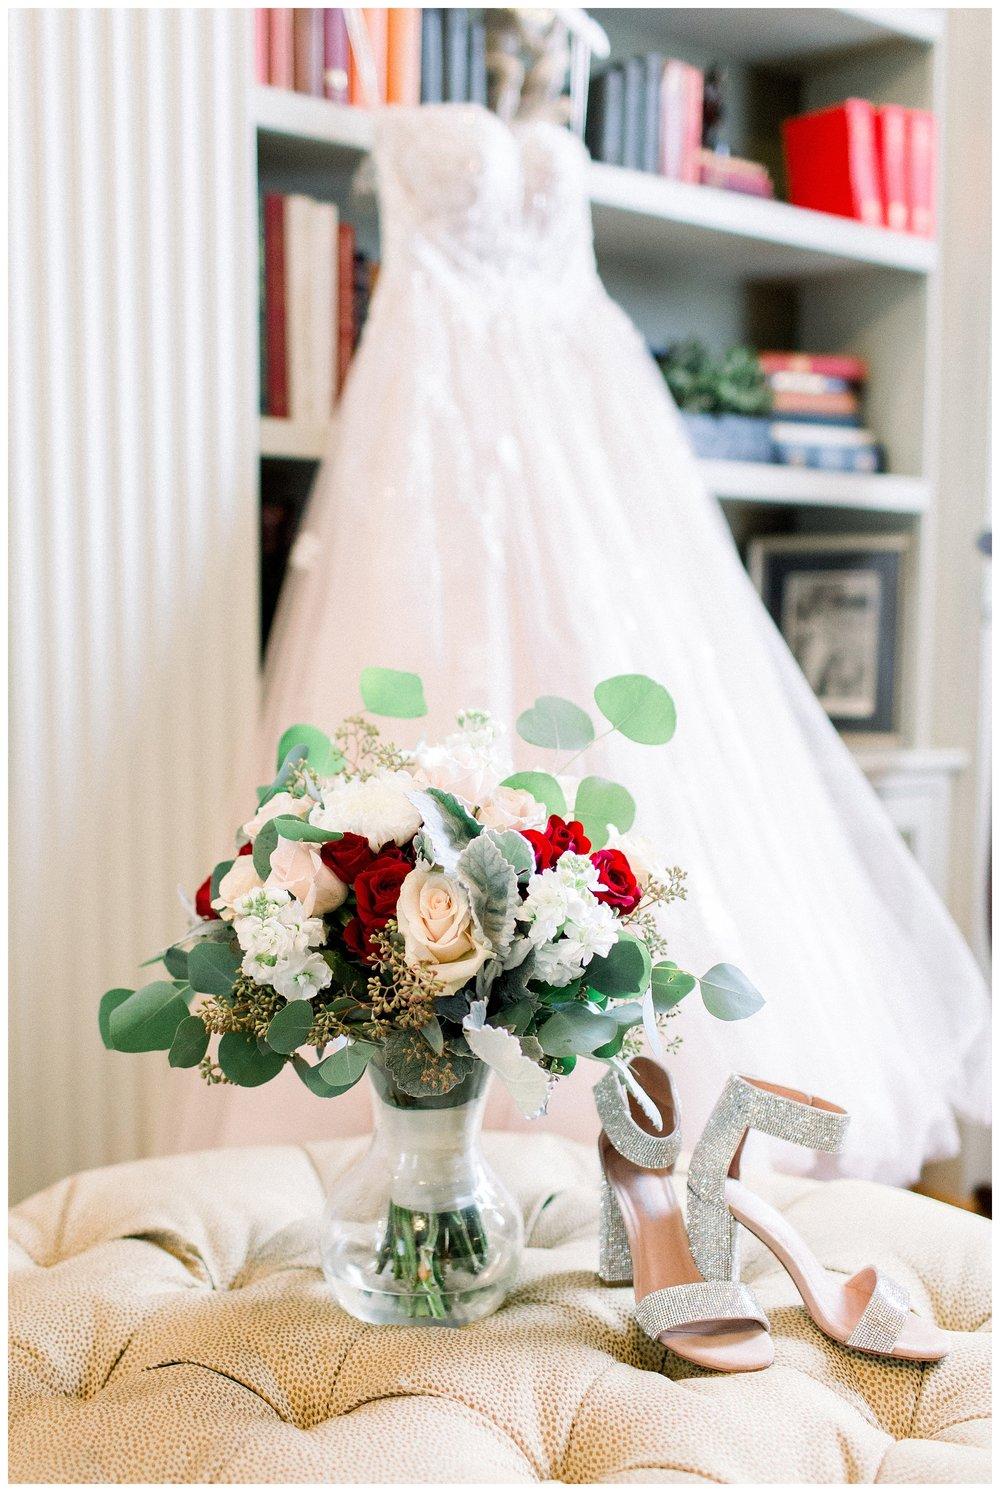 Whitehall Estate Wedding | Northern Virginia Wedding Photographer Kir Tuben_0014.jpg